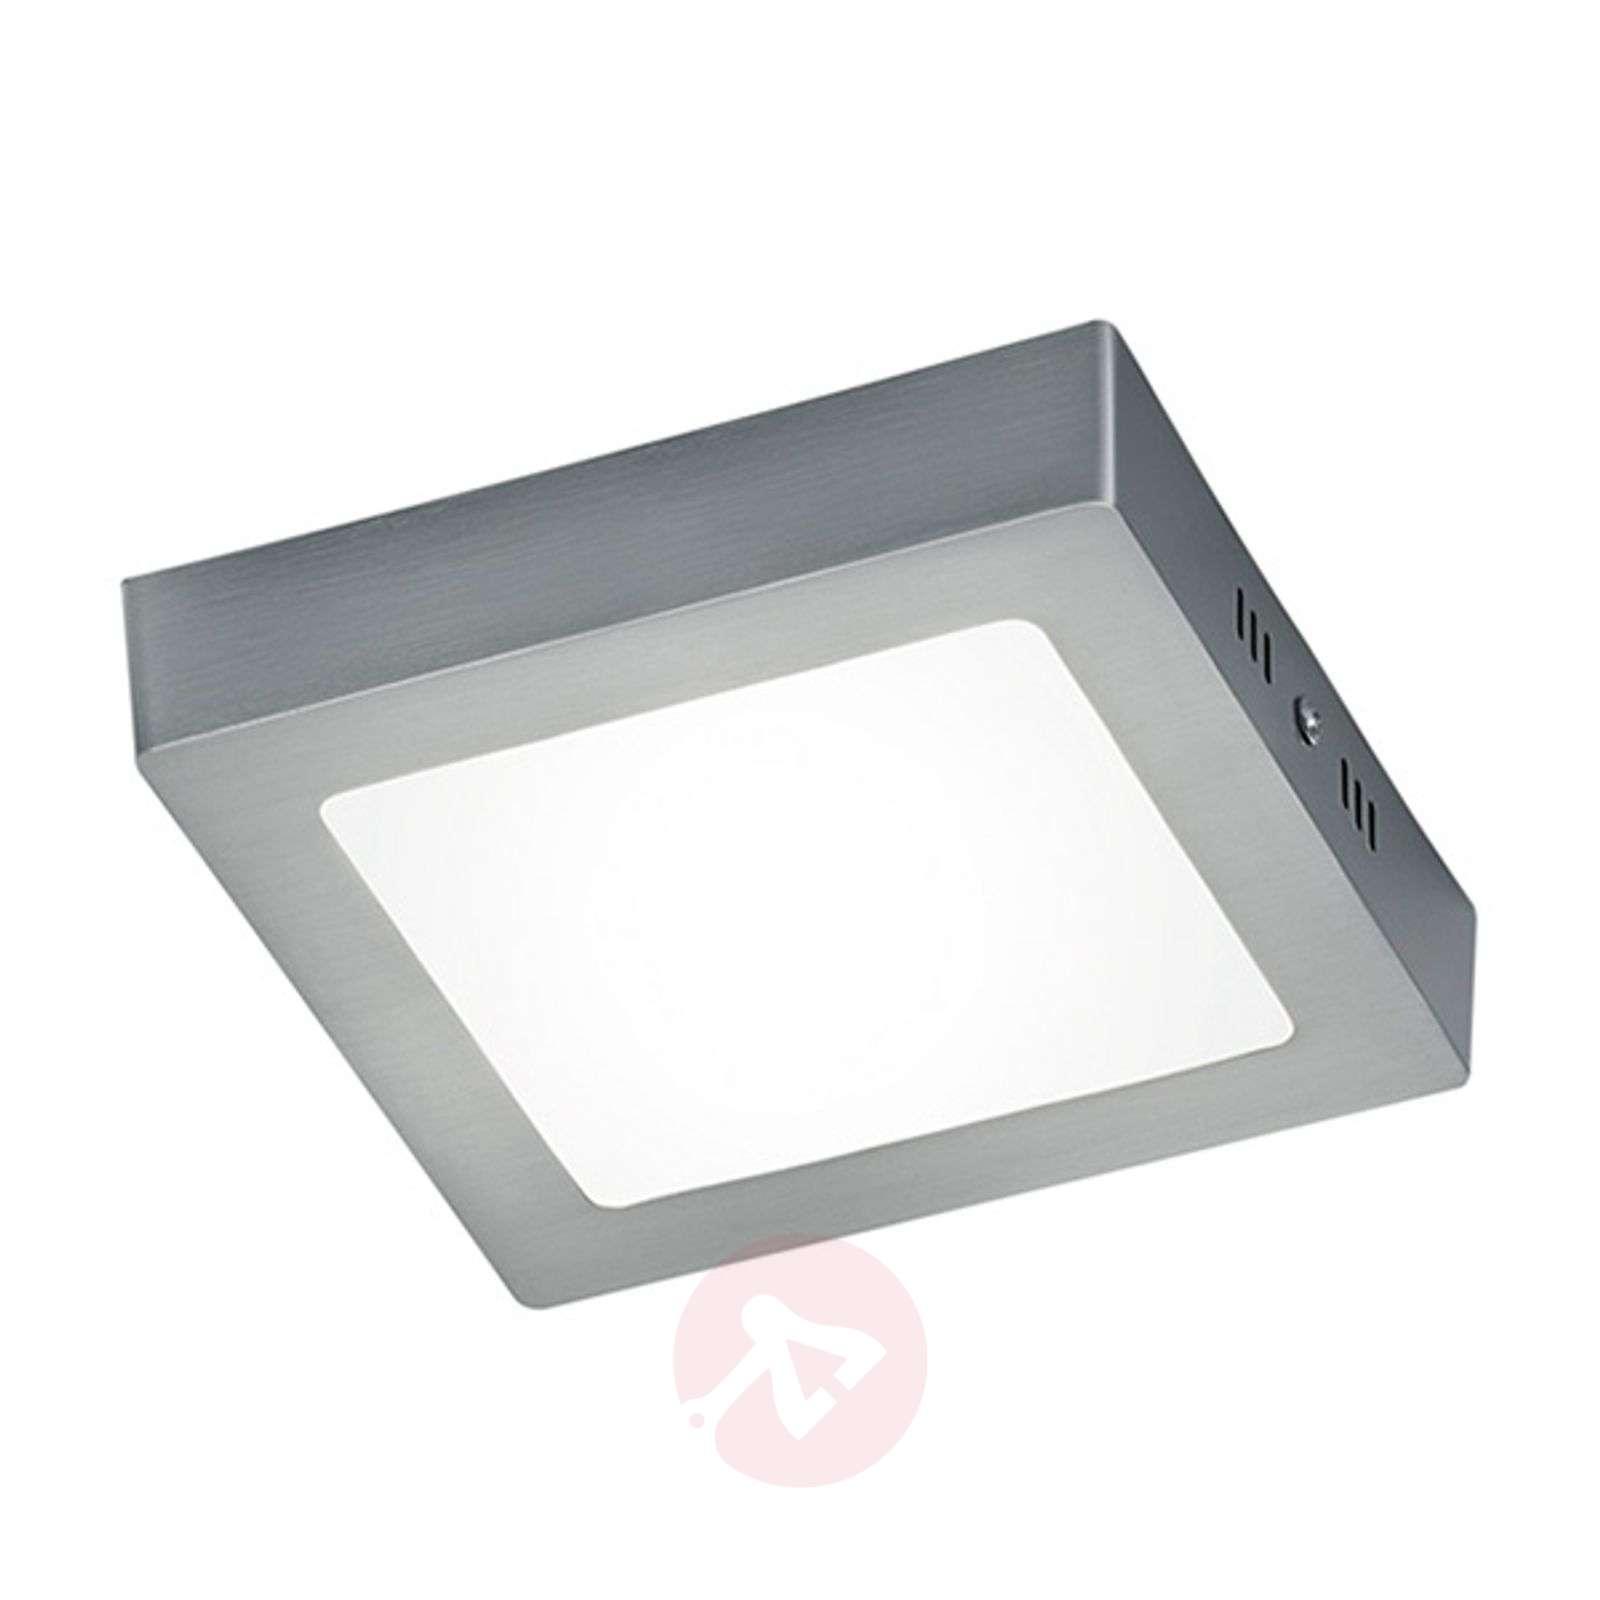 Zeus a timeless LED ceiling light-9004776-01